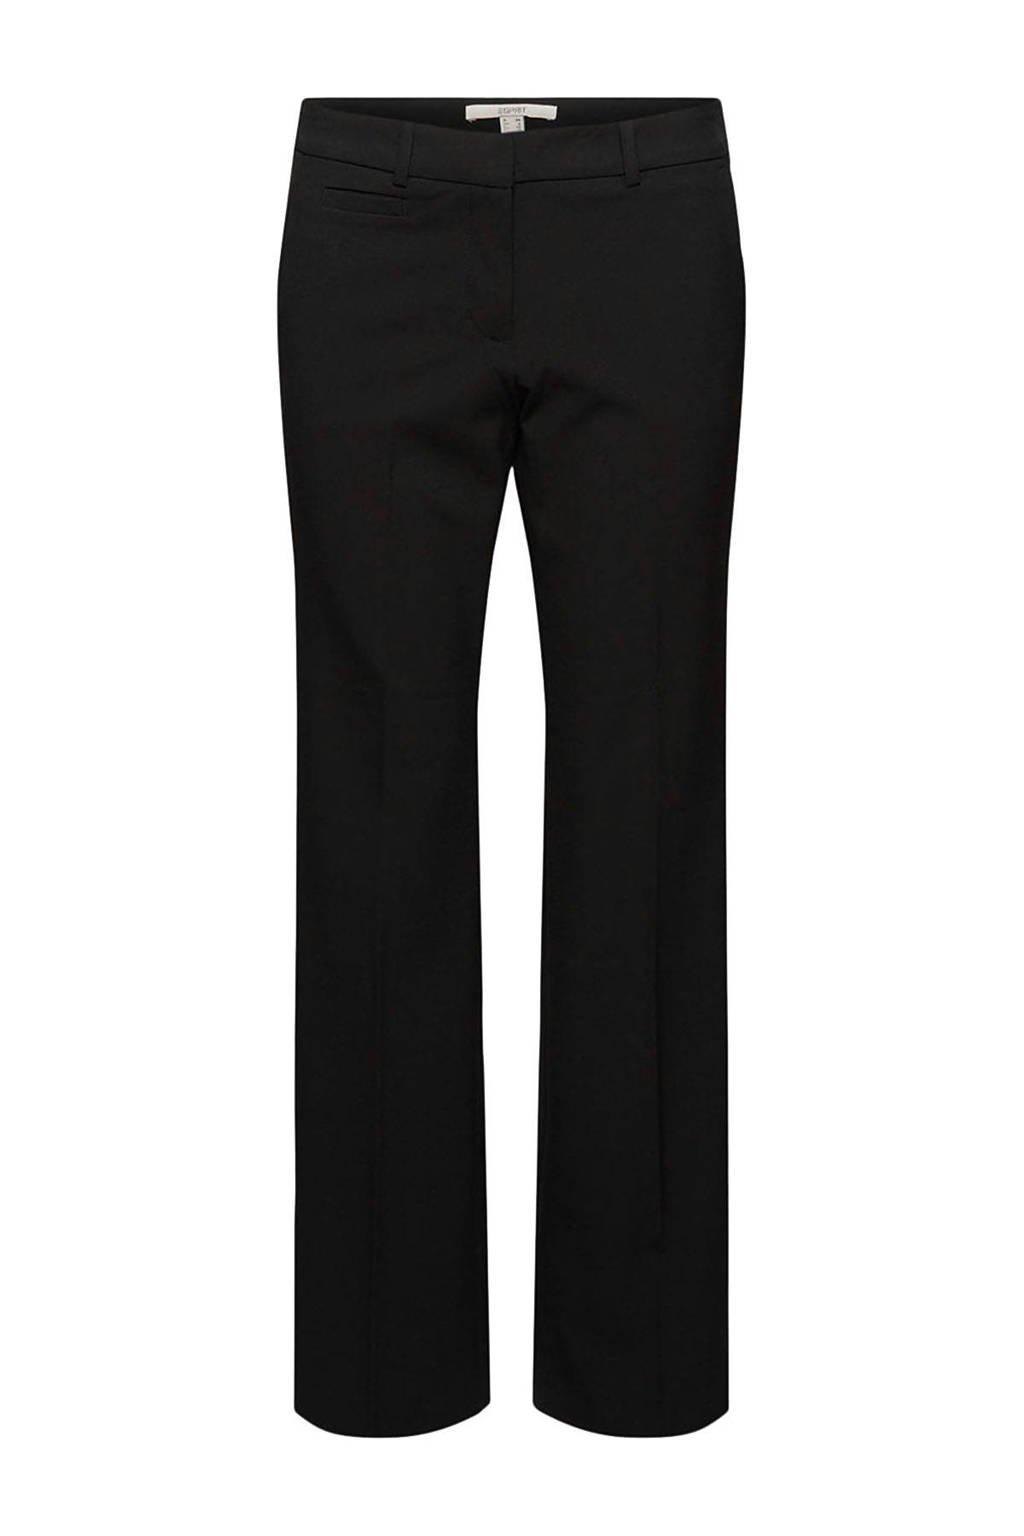 edc Women straight fit broek zwart, Zwart